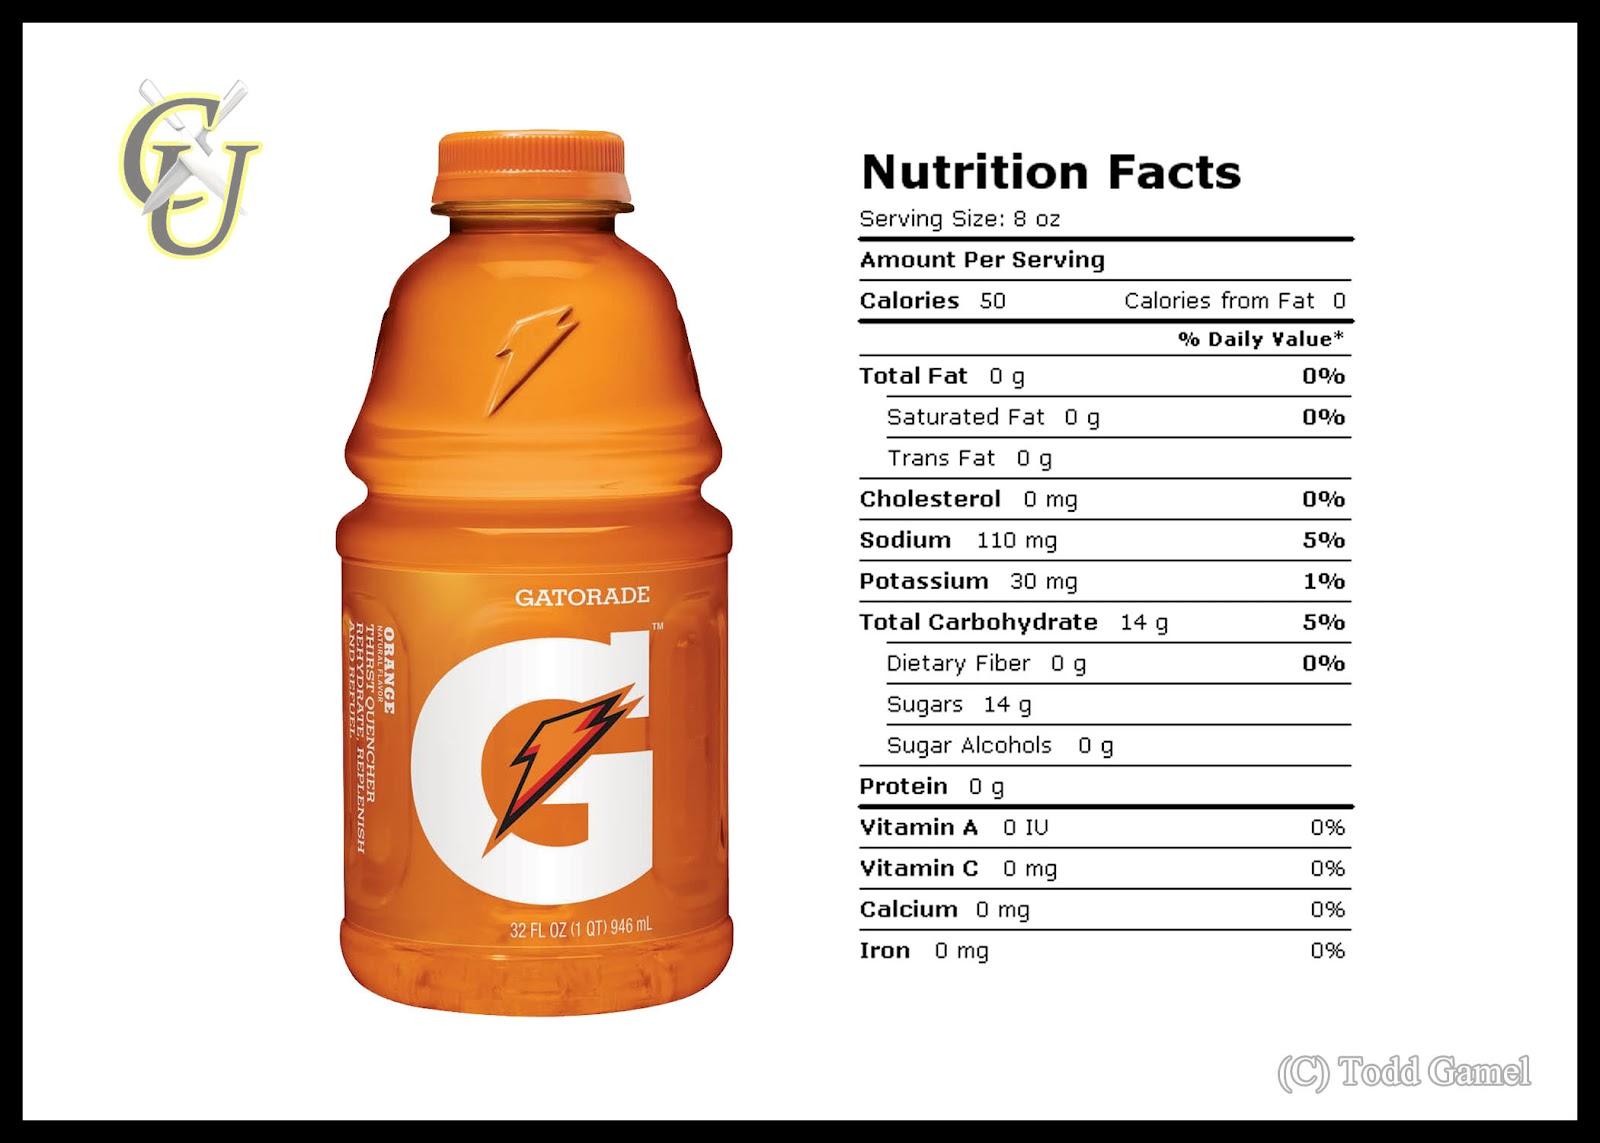 Gatorade G2 Nutrition Facts